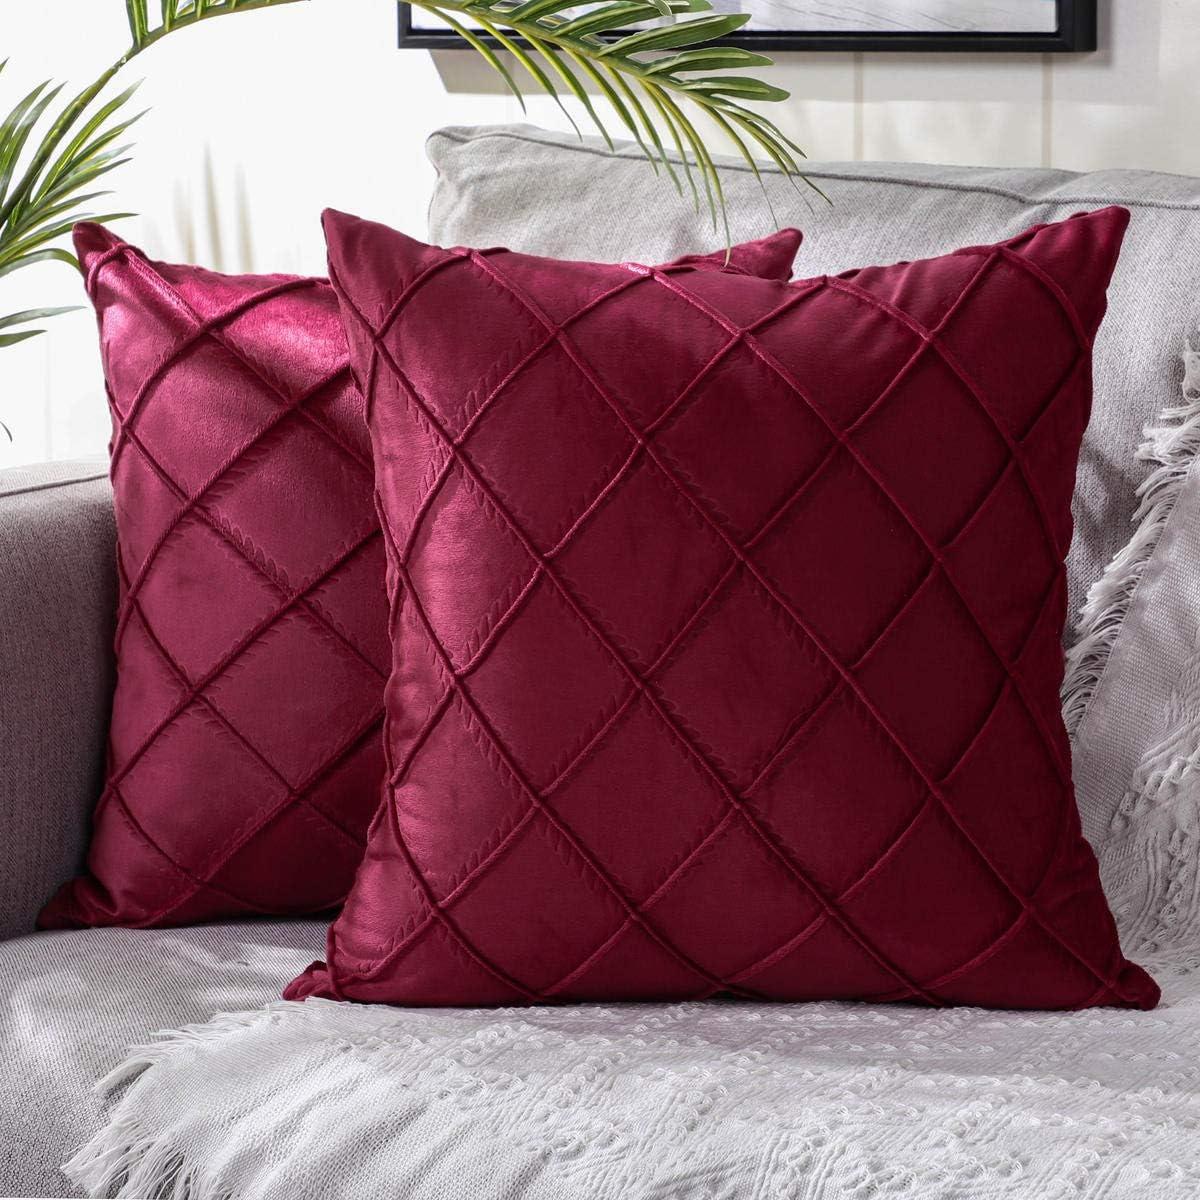 unisex Ranking TOP10 DEELAND Pack of 2 Velvet Decorative Pillow Pil Throw Soft Covers